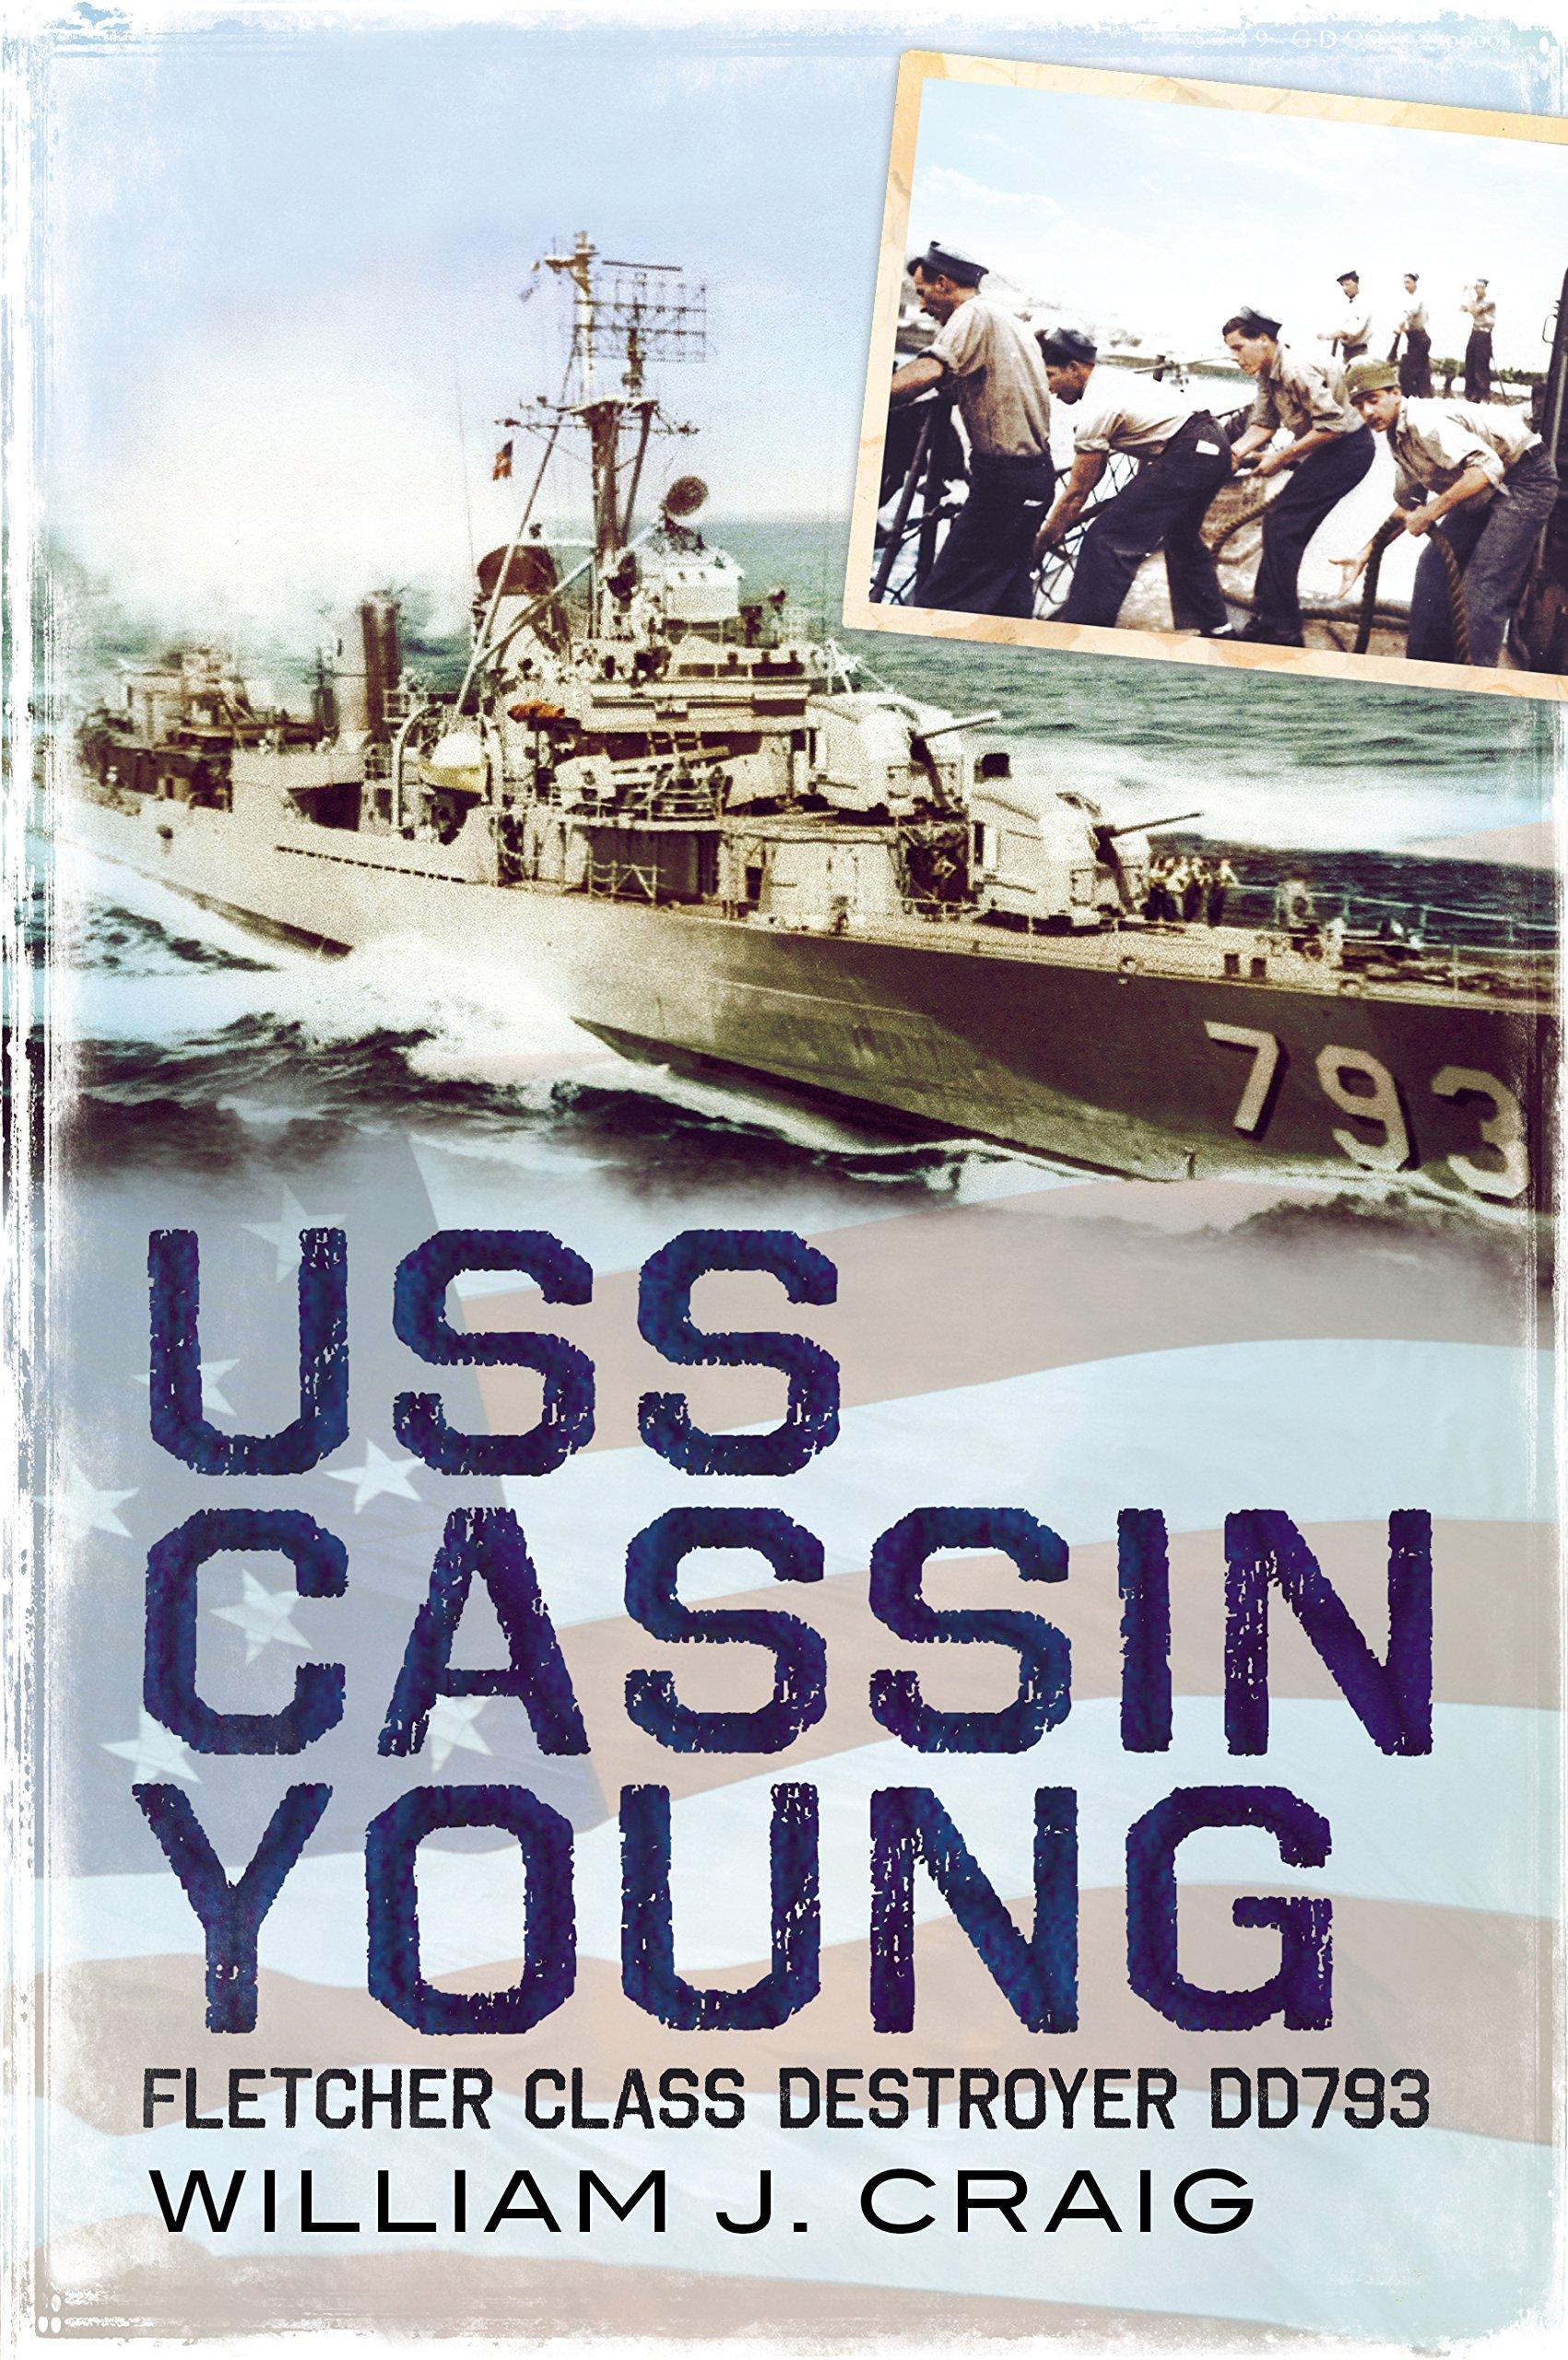 USS Cassin Young: Fletcher Class Destroyer DD 793: William J